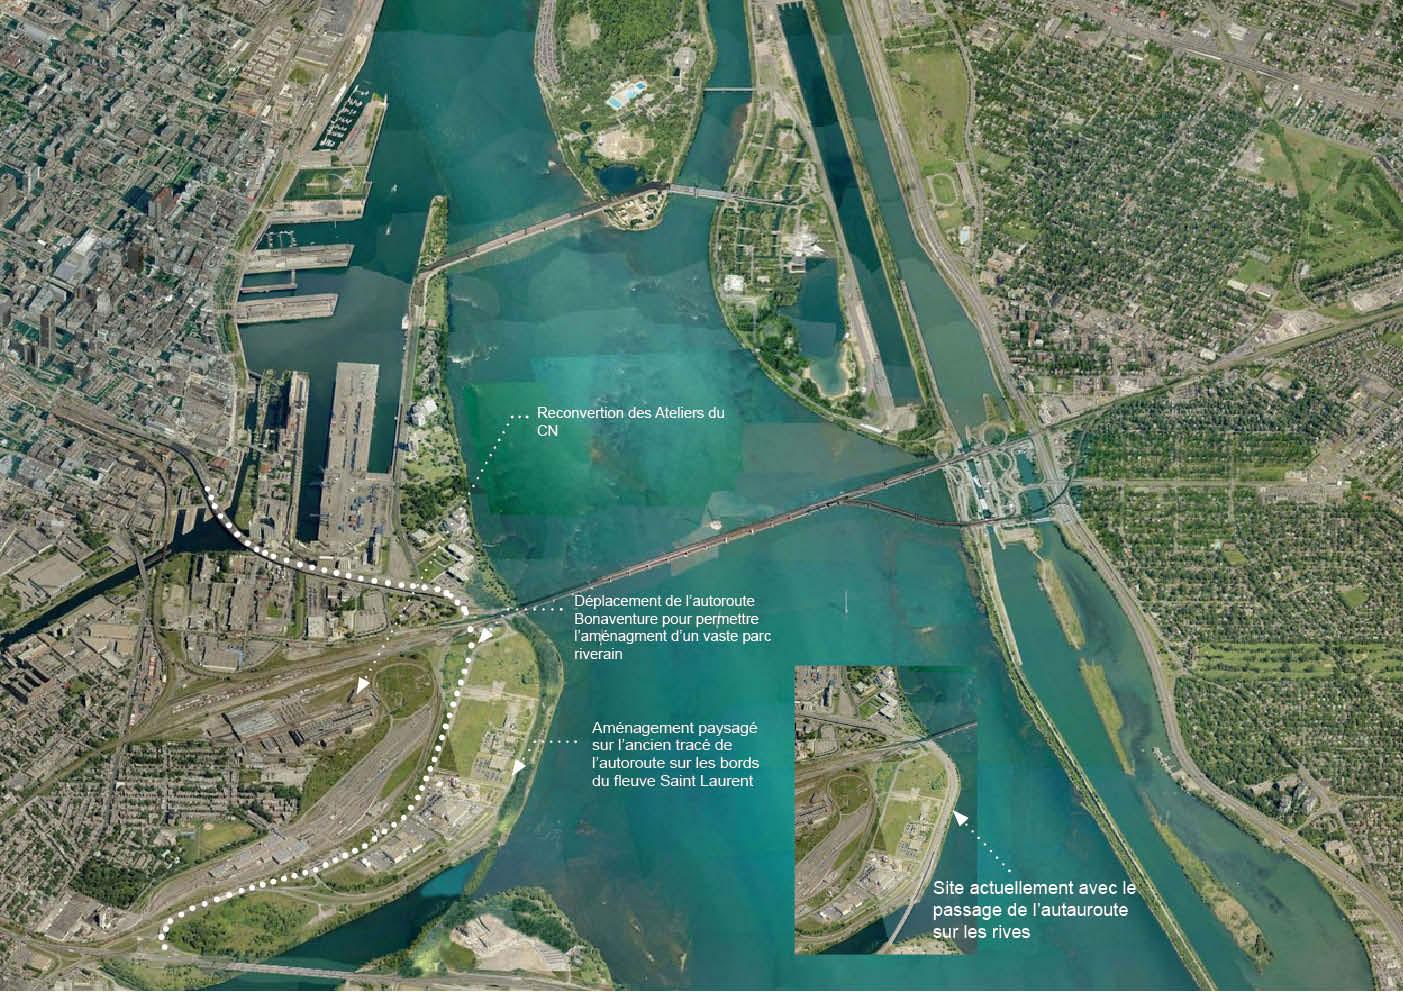 Plan-projet-amneagment-parc-montreal.jpg